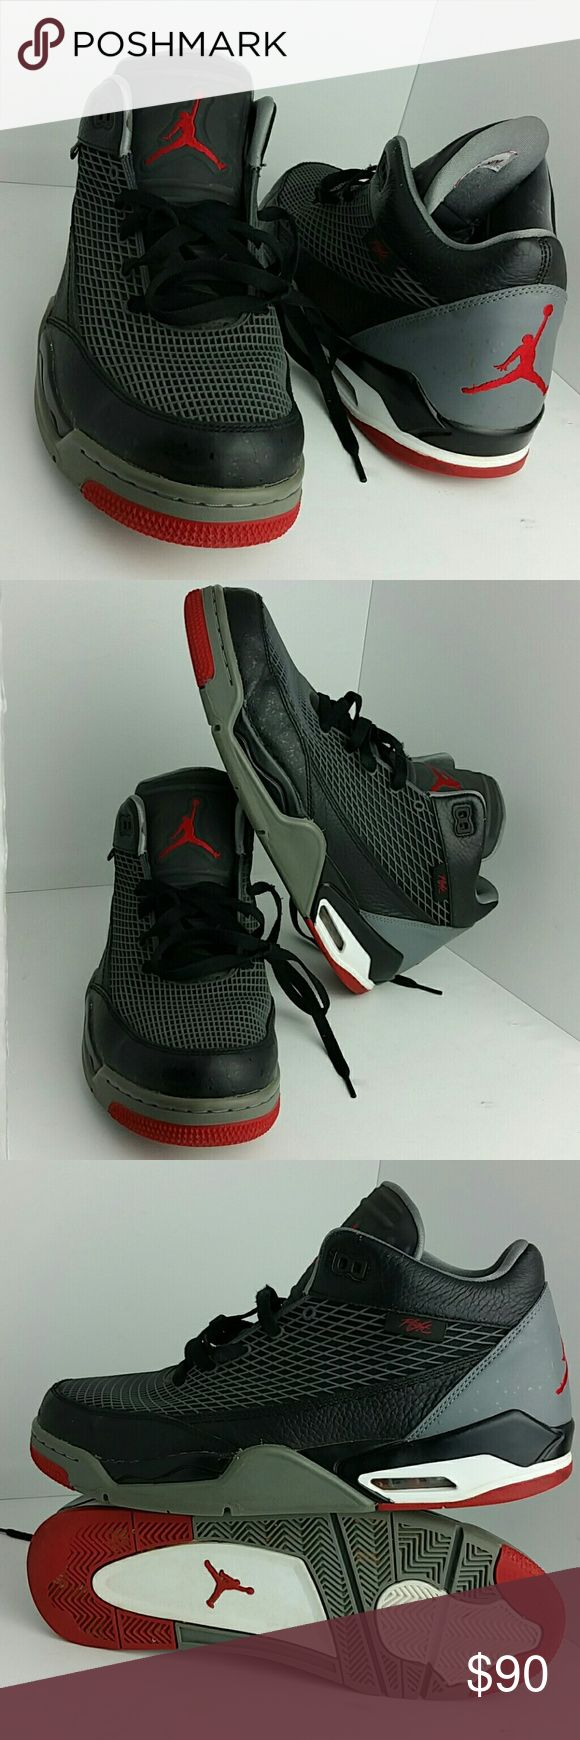 AIR JORDAN FLIGHT CLUB 80'S MEN'S SHOES VERY CLEAN INSIDE-OUT   SKE # KE Air Jordan Shoes Athletic Shoes